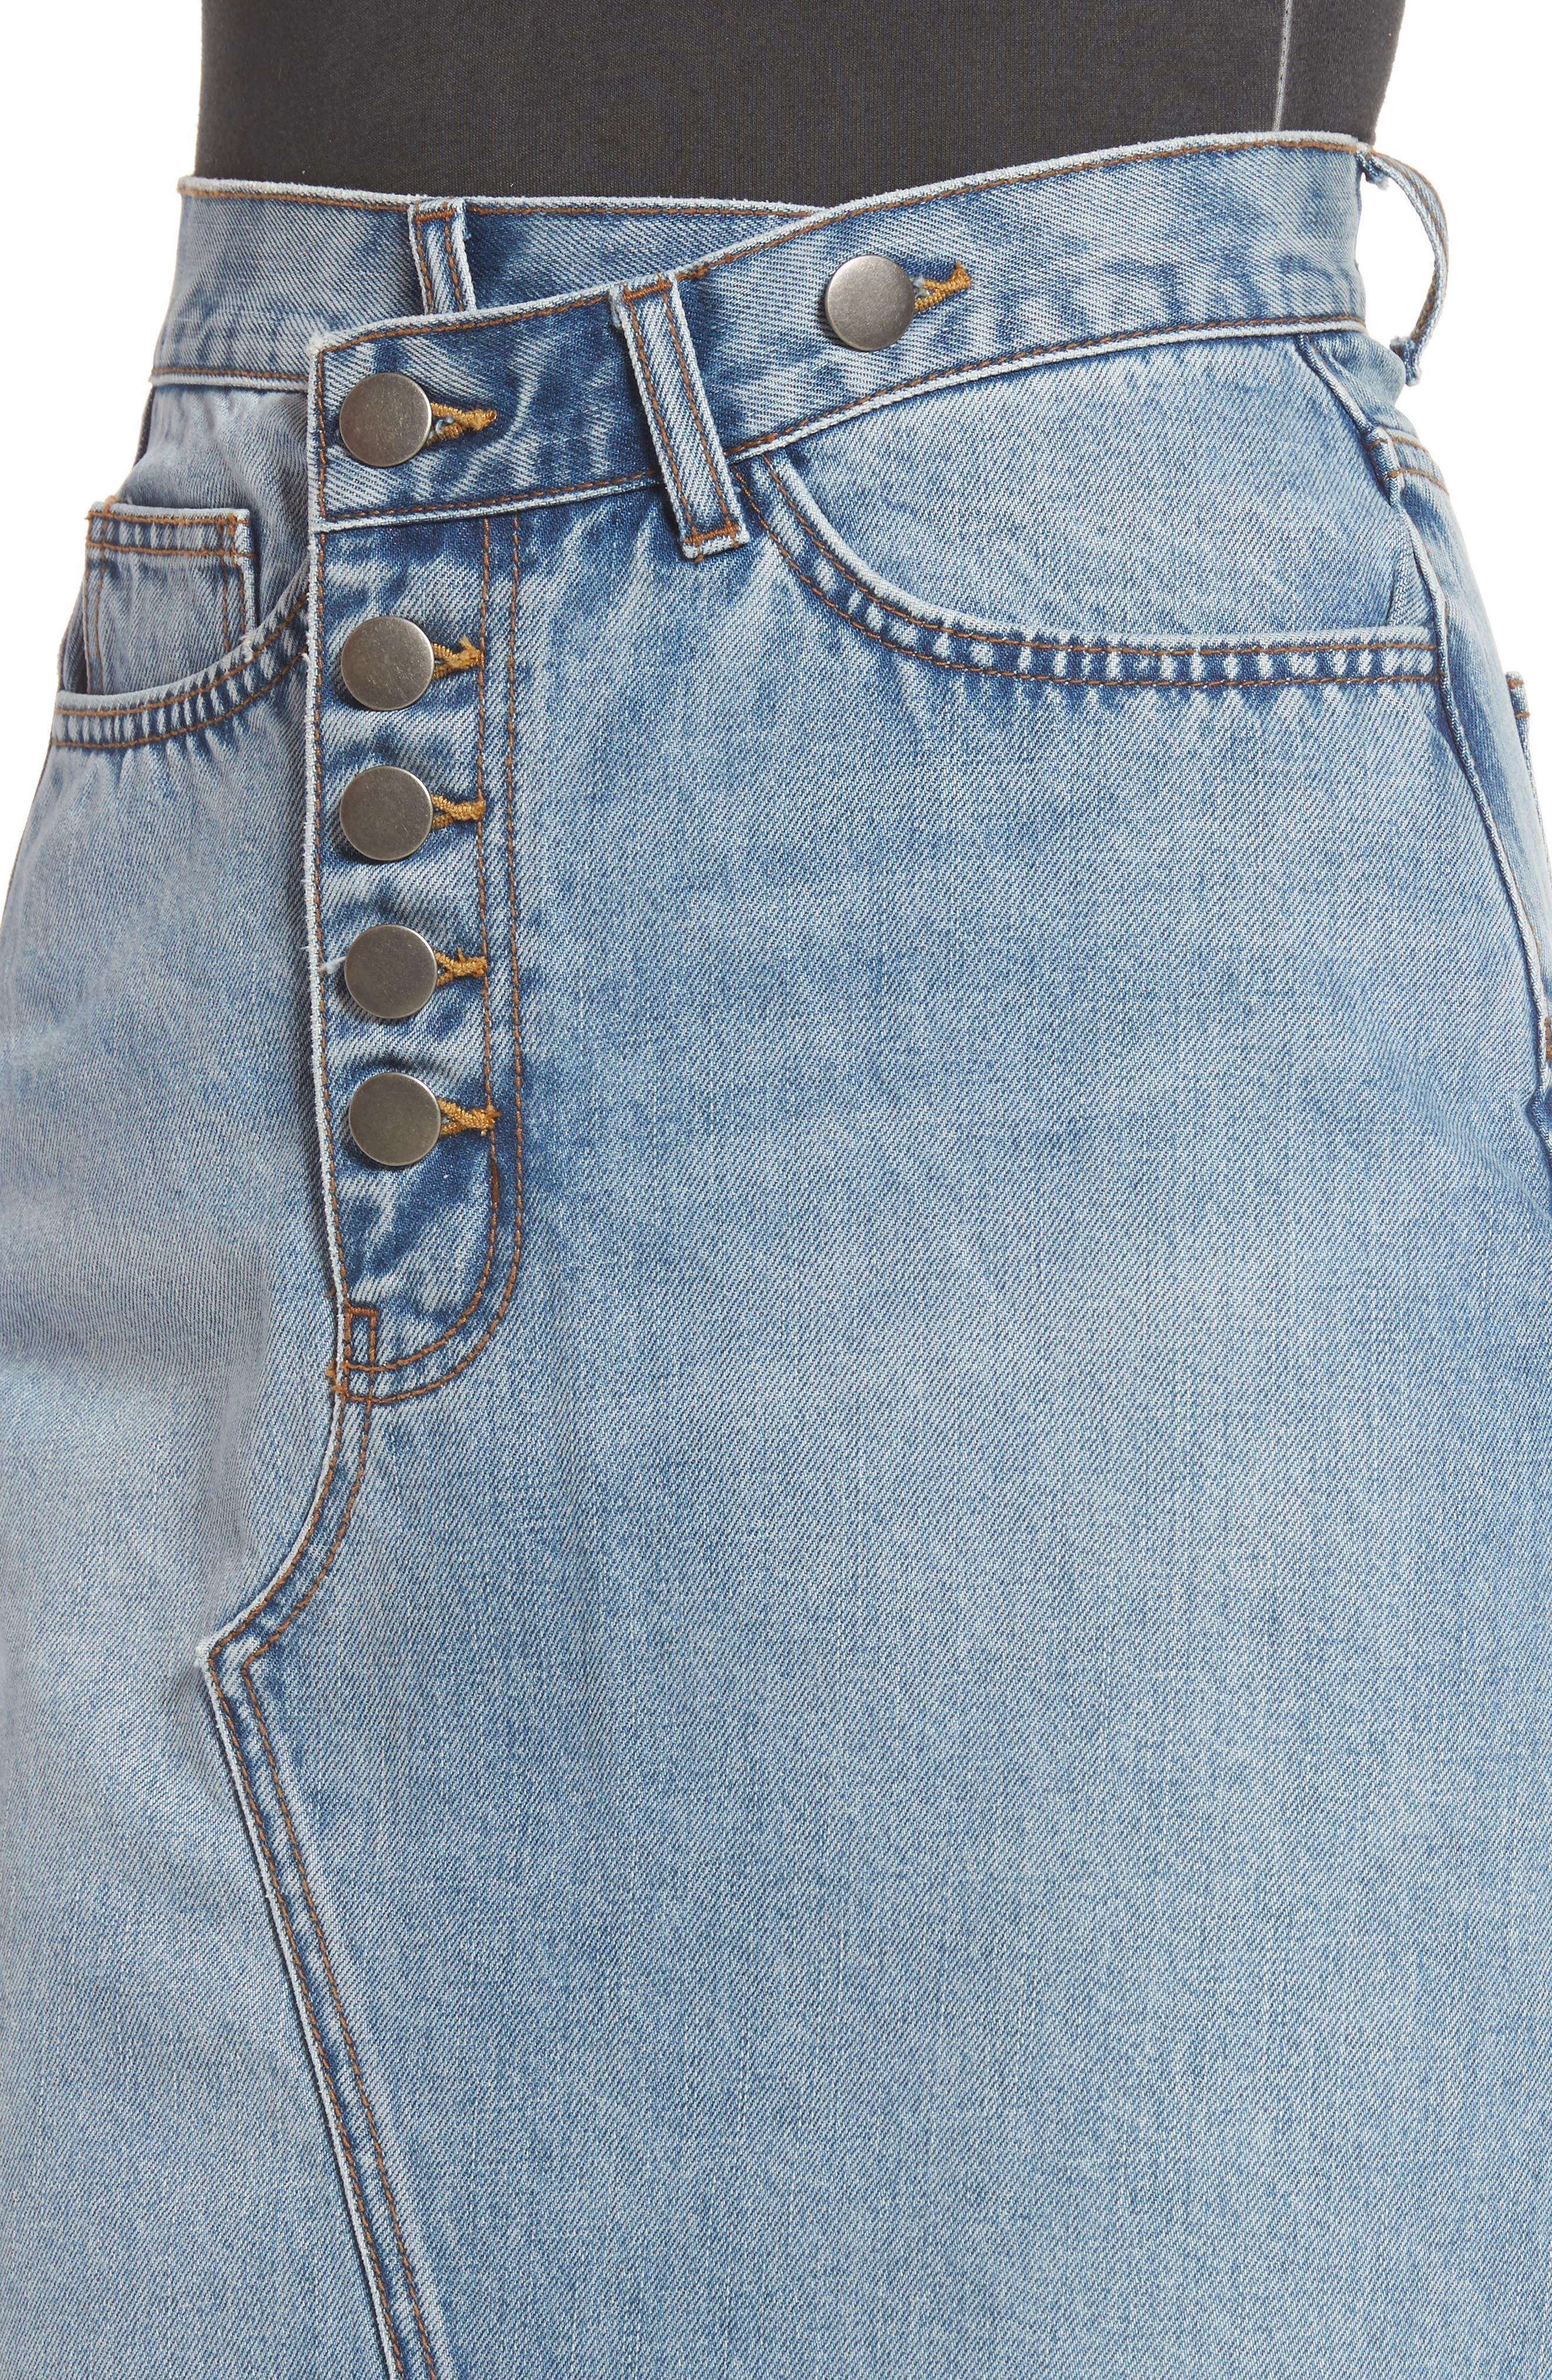 Asymmetrical Denim Pencil Skirt,                             Alternate thumbnail 4, color,                             410